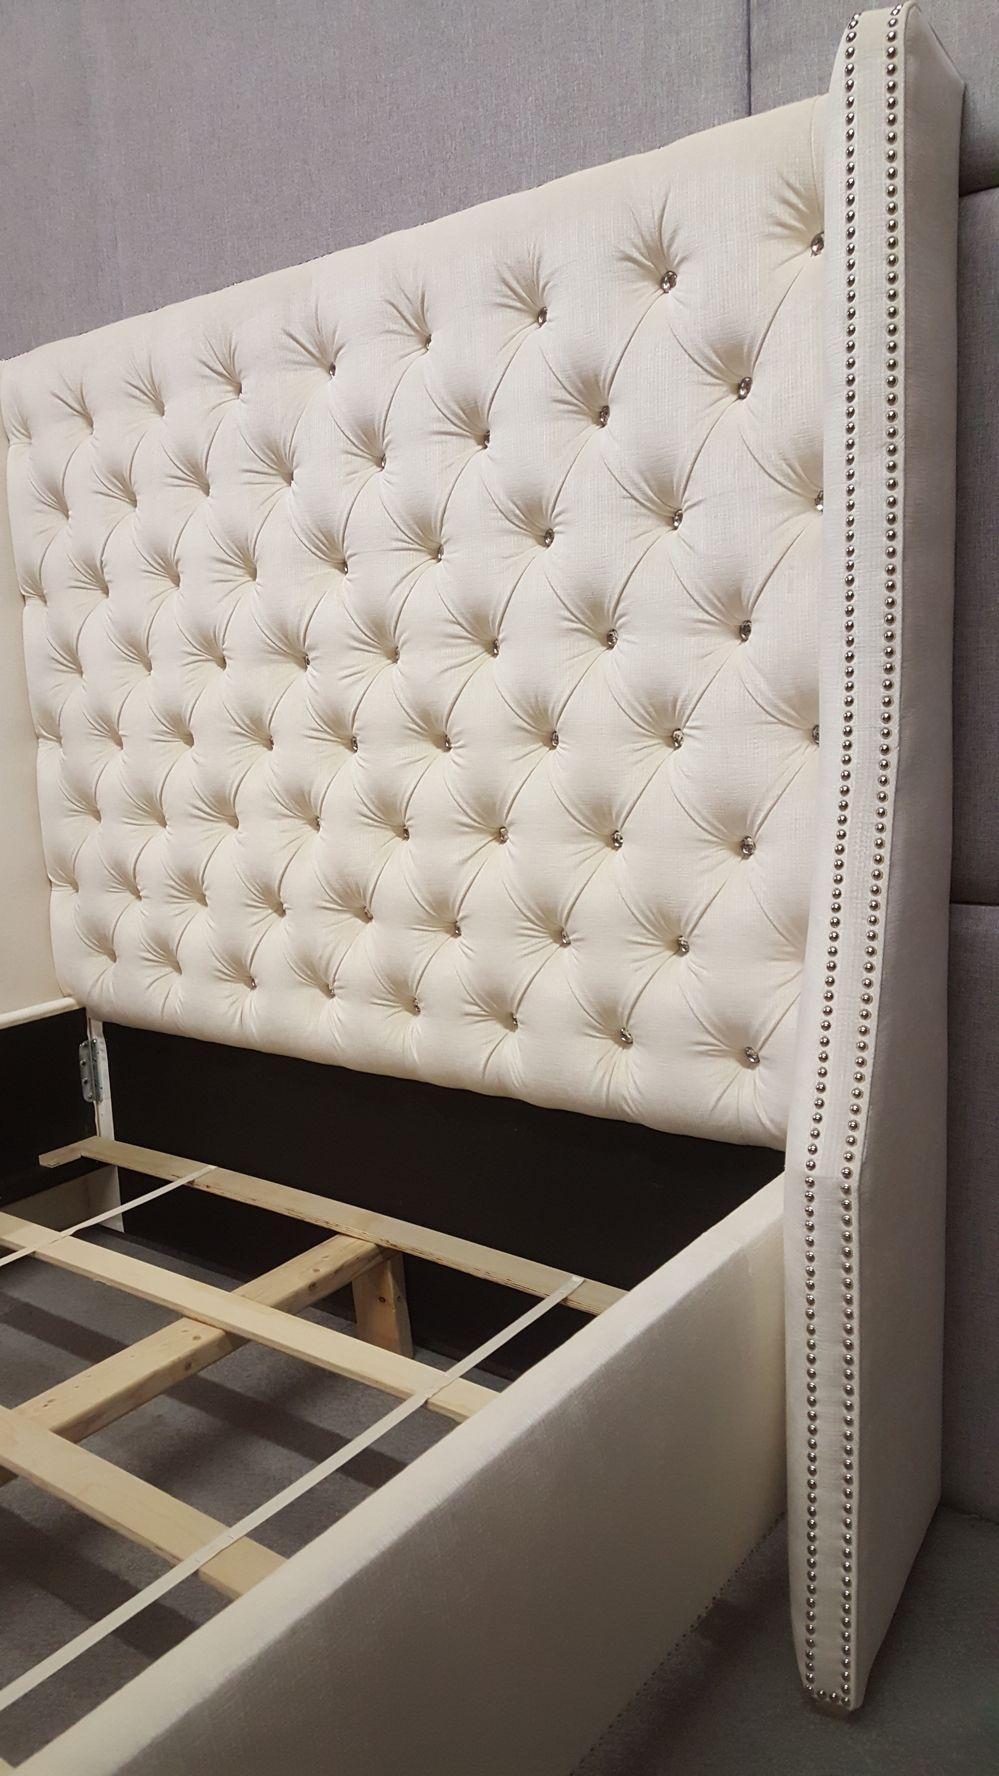 Cama tapizada. | Dormitorios | Pinterest | Upholstery, Bed furniture ...